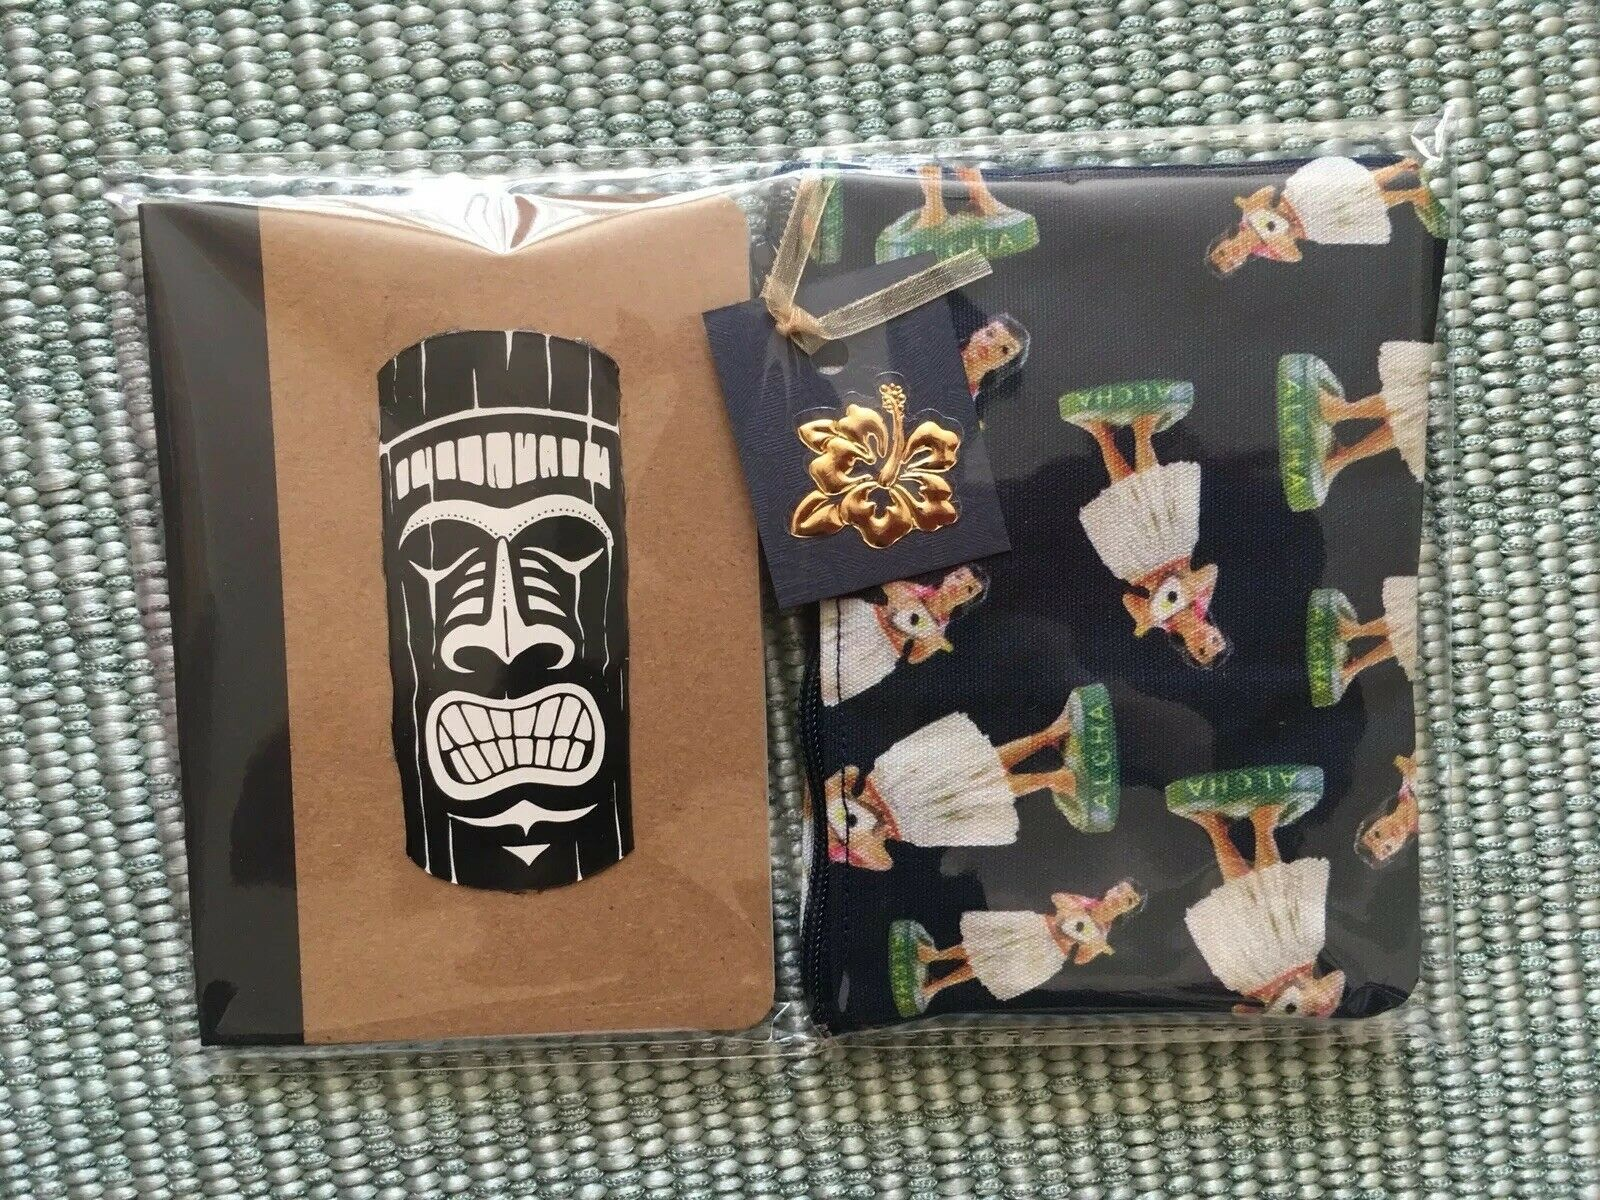 Hawaii Tiki God Notebook + Hula Girl Navy Cosmetic Bag Retro 2pc Gift Set